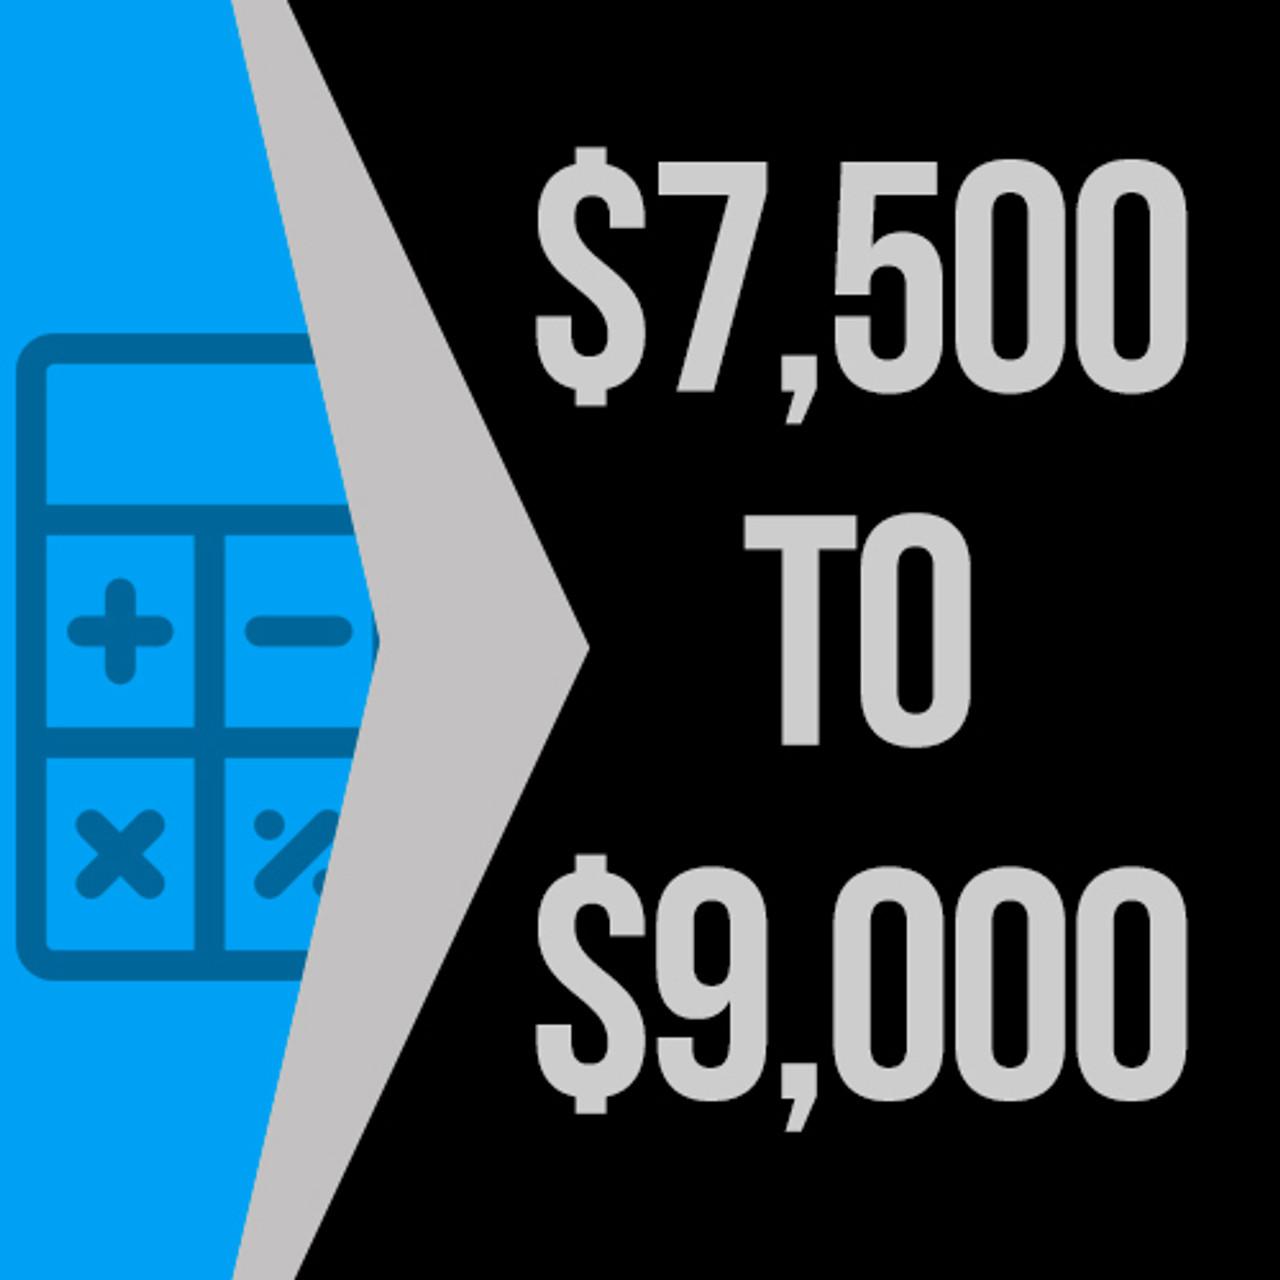 $7500 to $9000